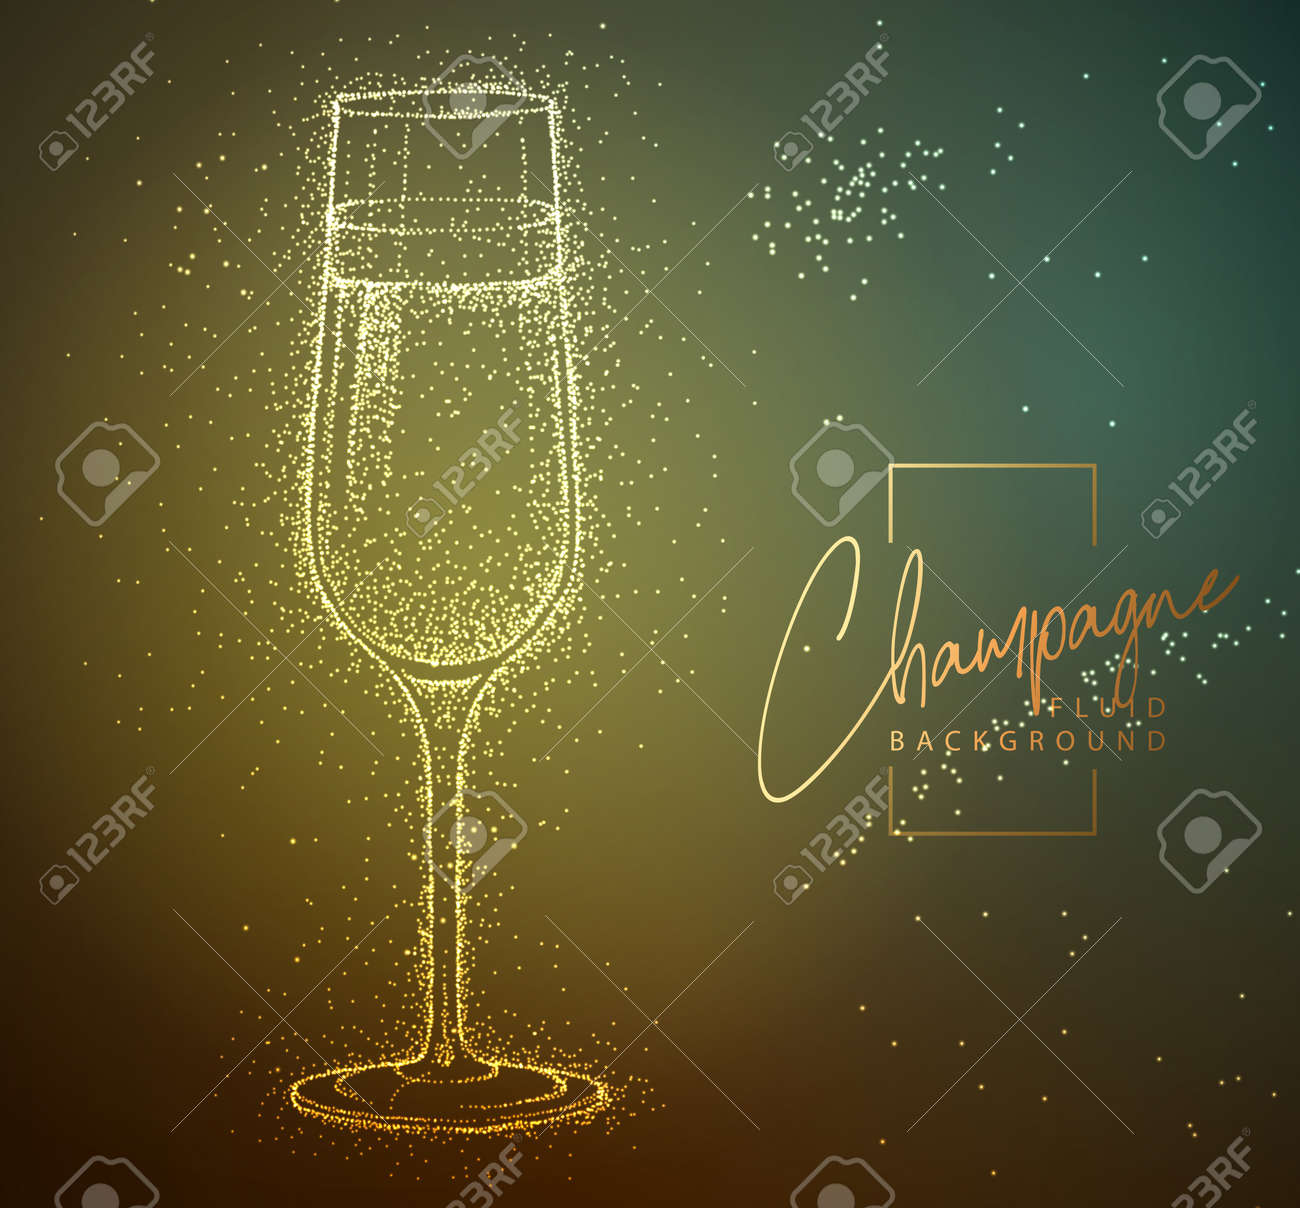 Neon fluid champagne glass vector illustration. Fluid background. - 169211874